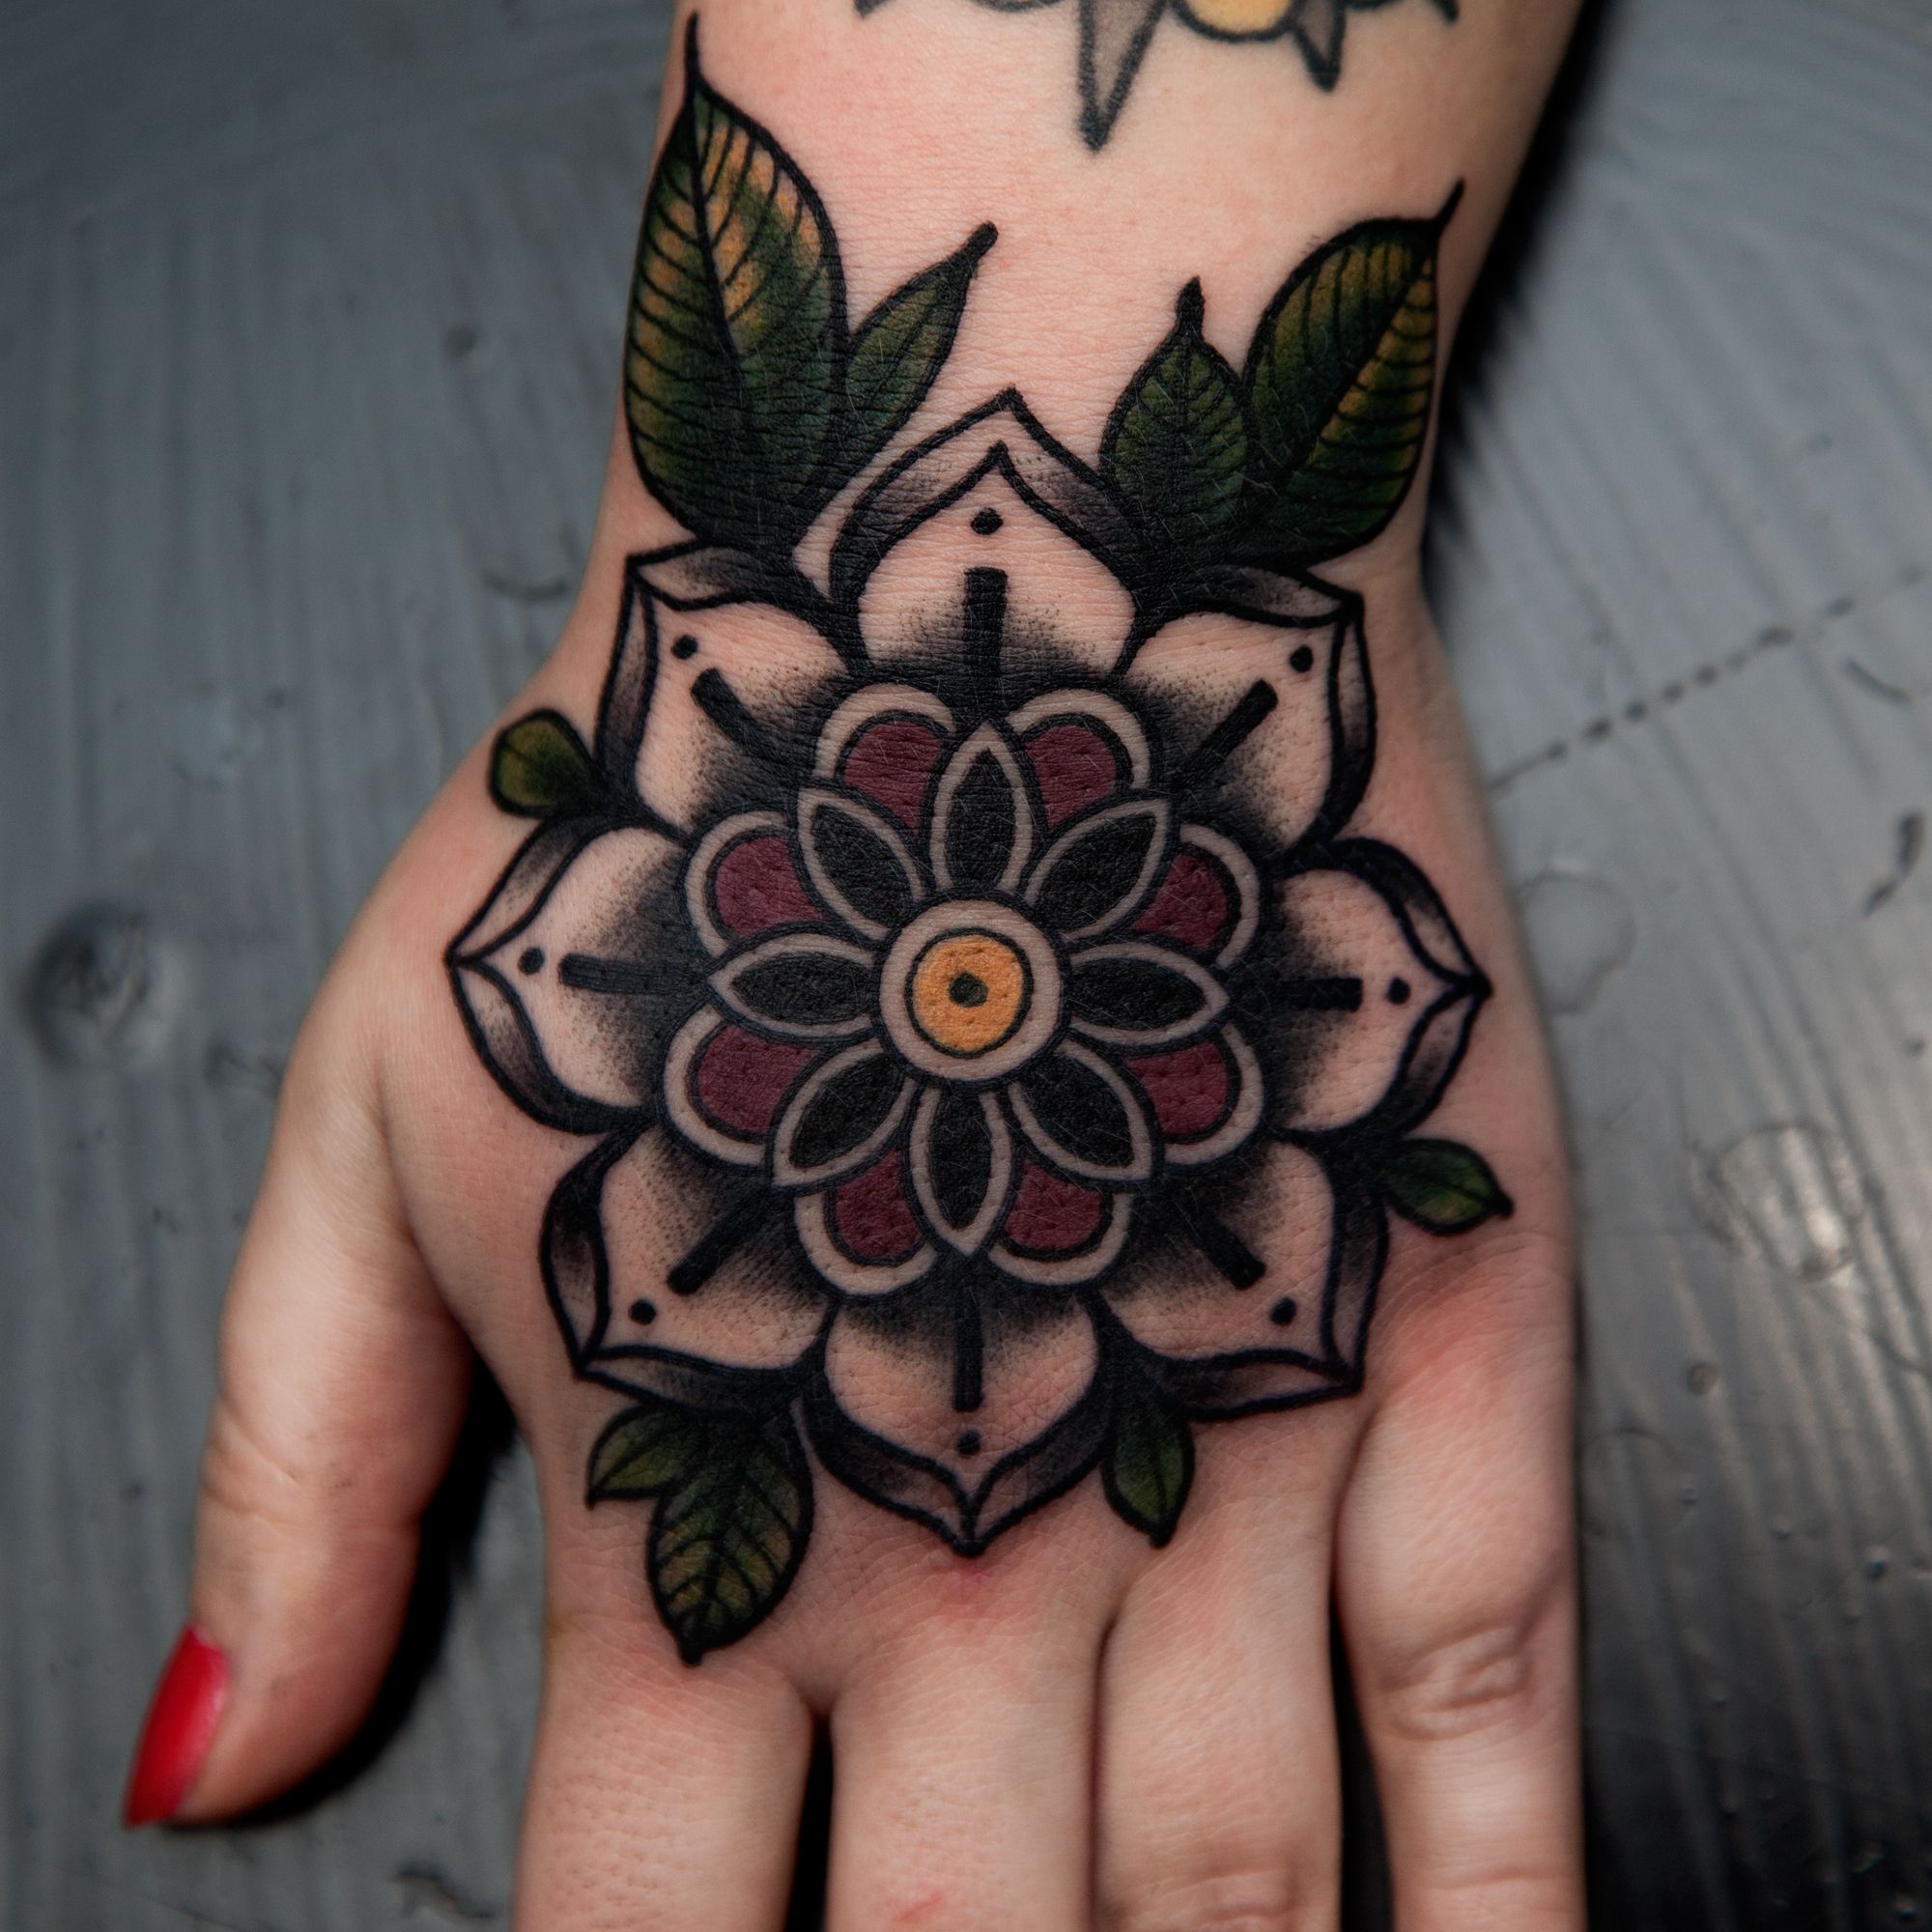 Flower Mandala Neo Traditional Blackwork Elisabetha Elisabethattatoo Hand Flowermandala Traditi Traditional Hand Tattoo Mandala Hand Tattoos Traditional Tattoo